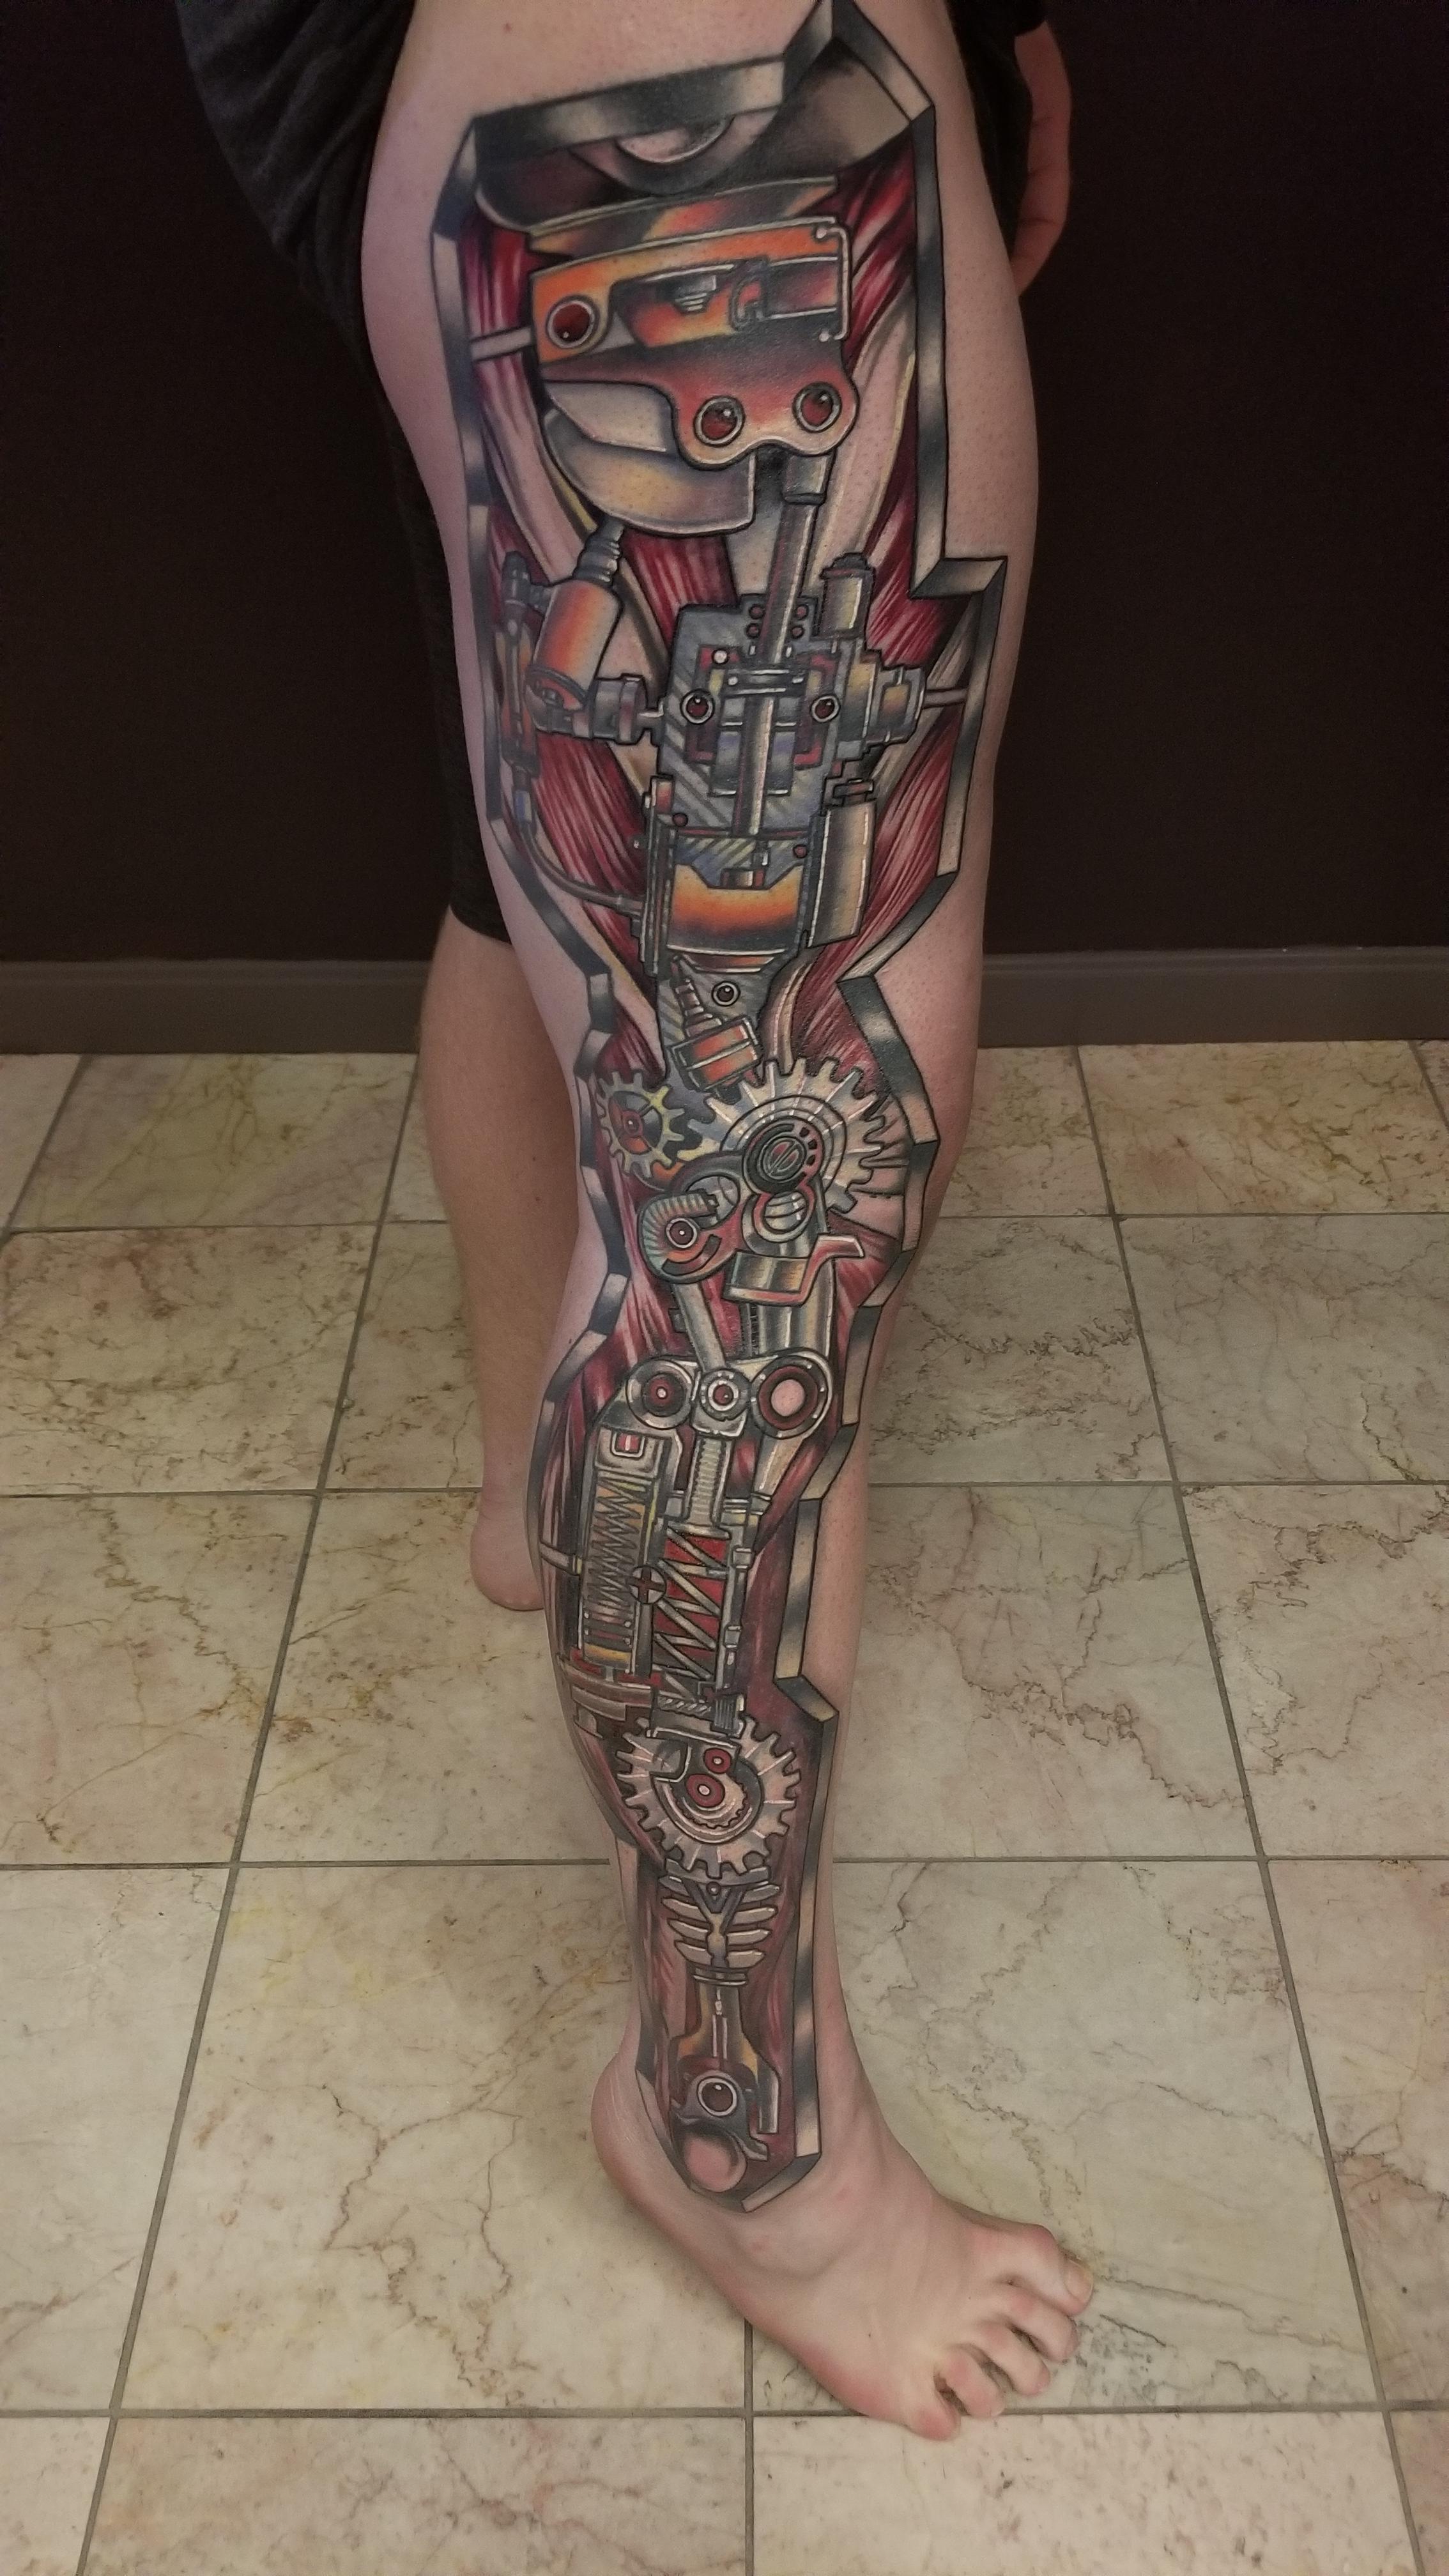 Biomechanical Leg Tattoo : biomechanical, tattoo, Biomechanical, Natan, Alexander, Witch, Salem,, Tattoos